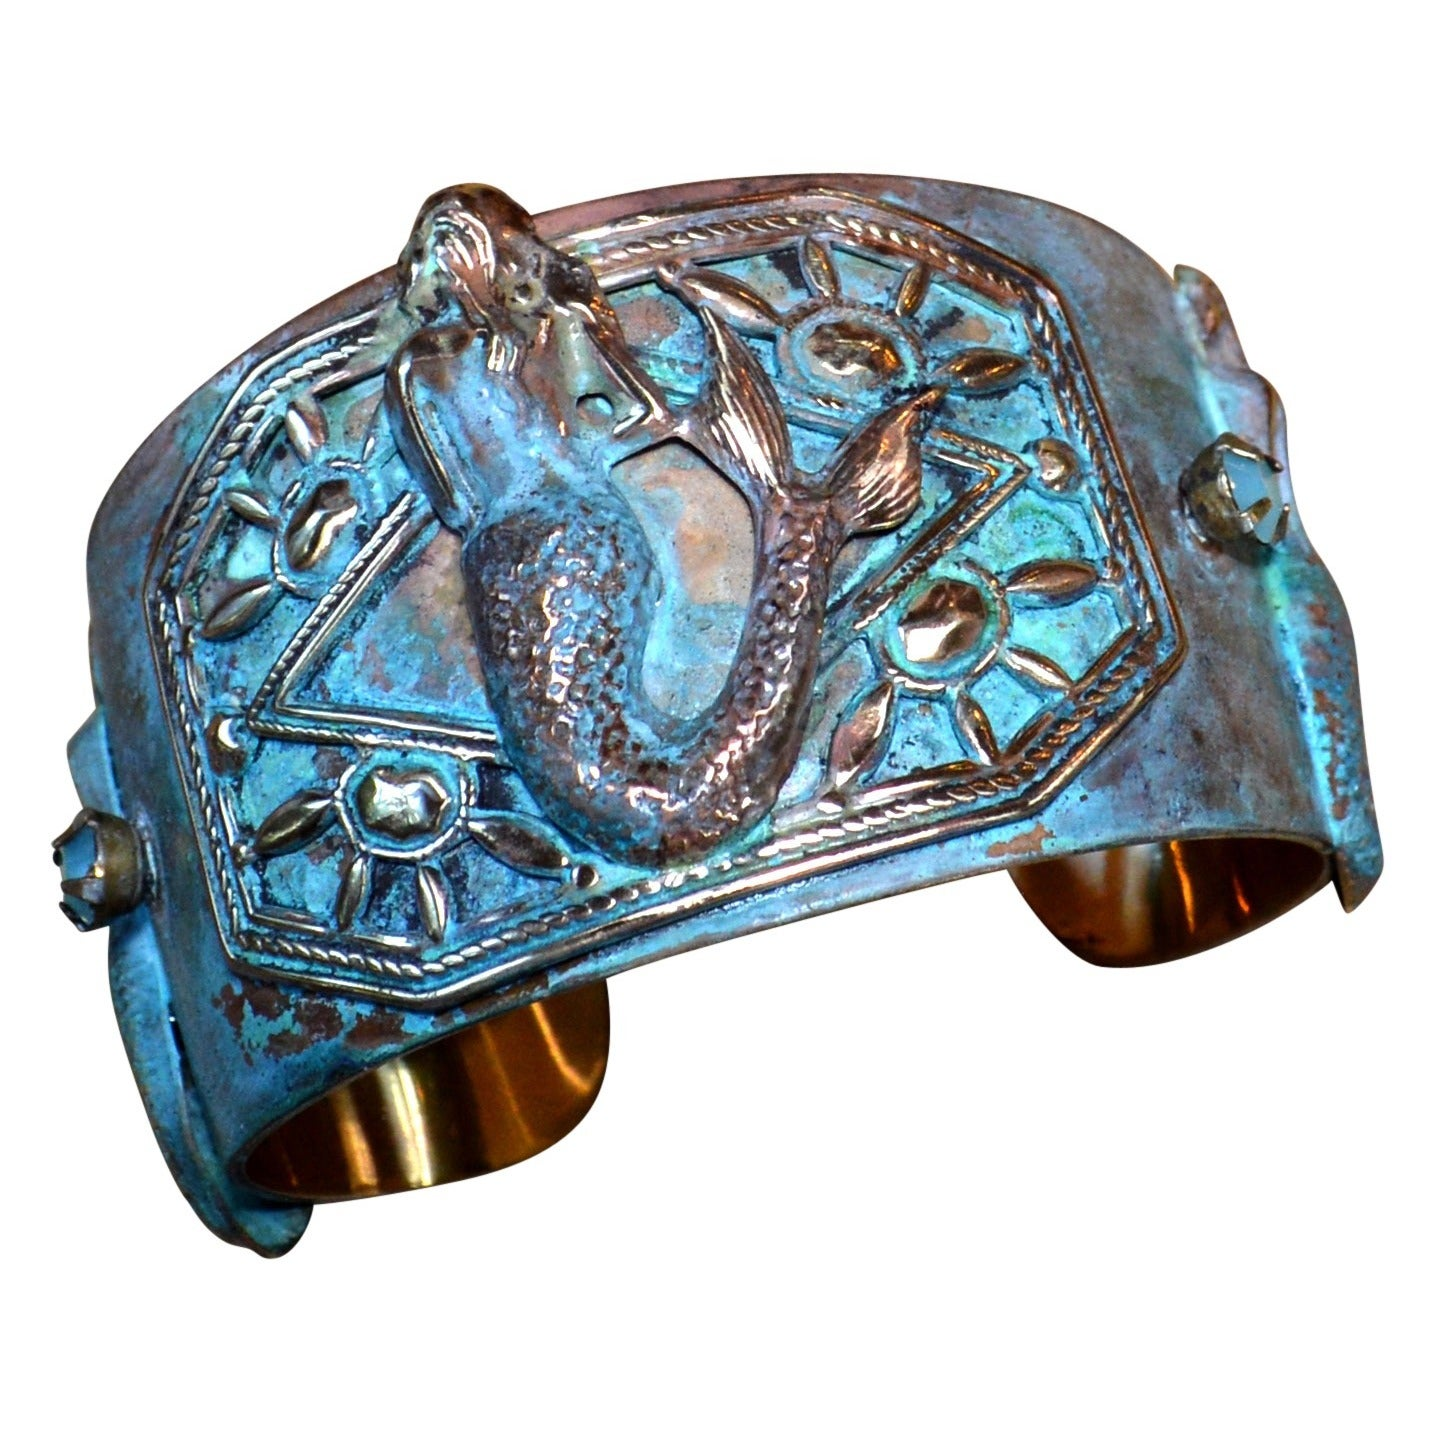 Handmade Patina Mermaid Cuff Bracelet with Swarovski Elem...